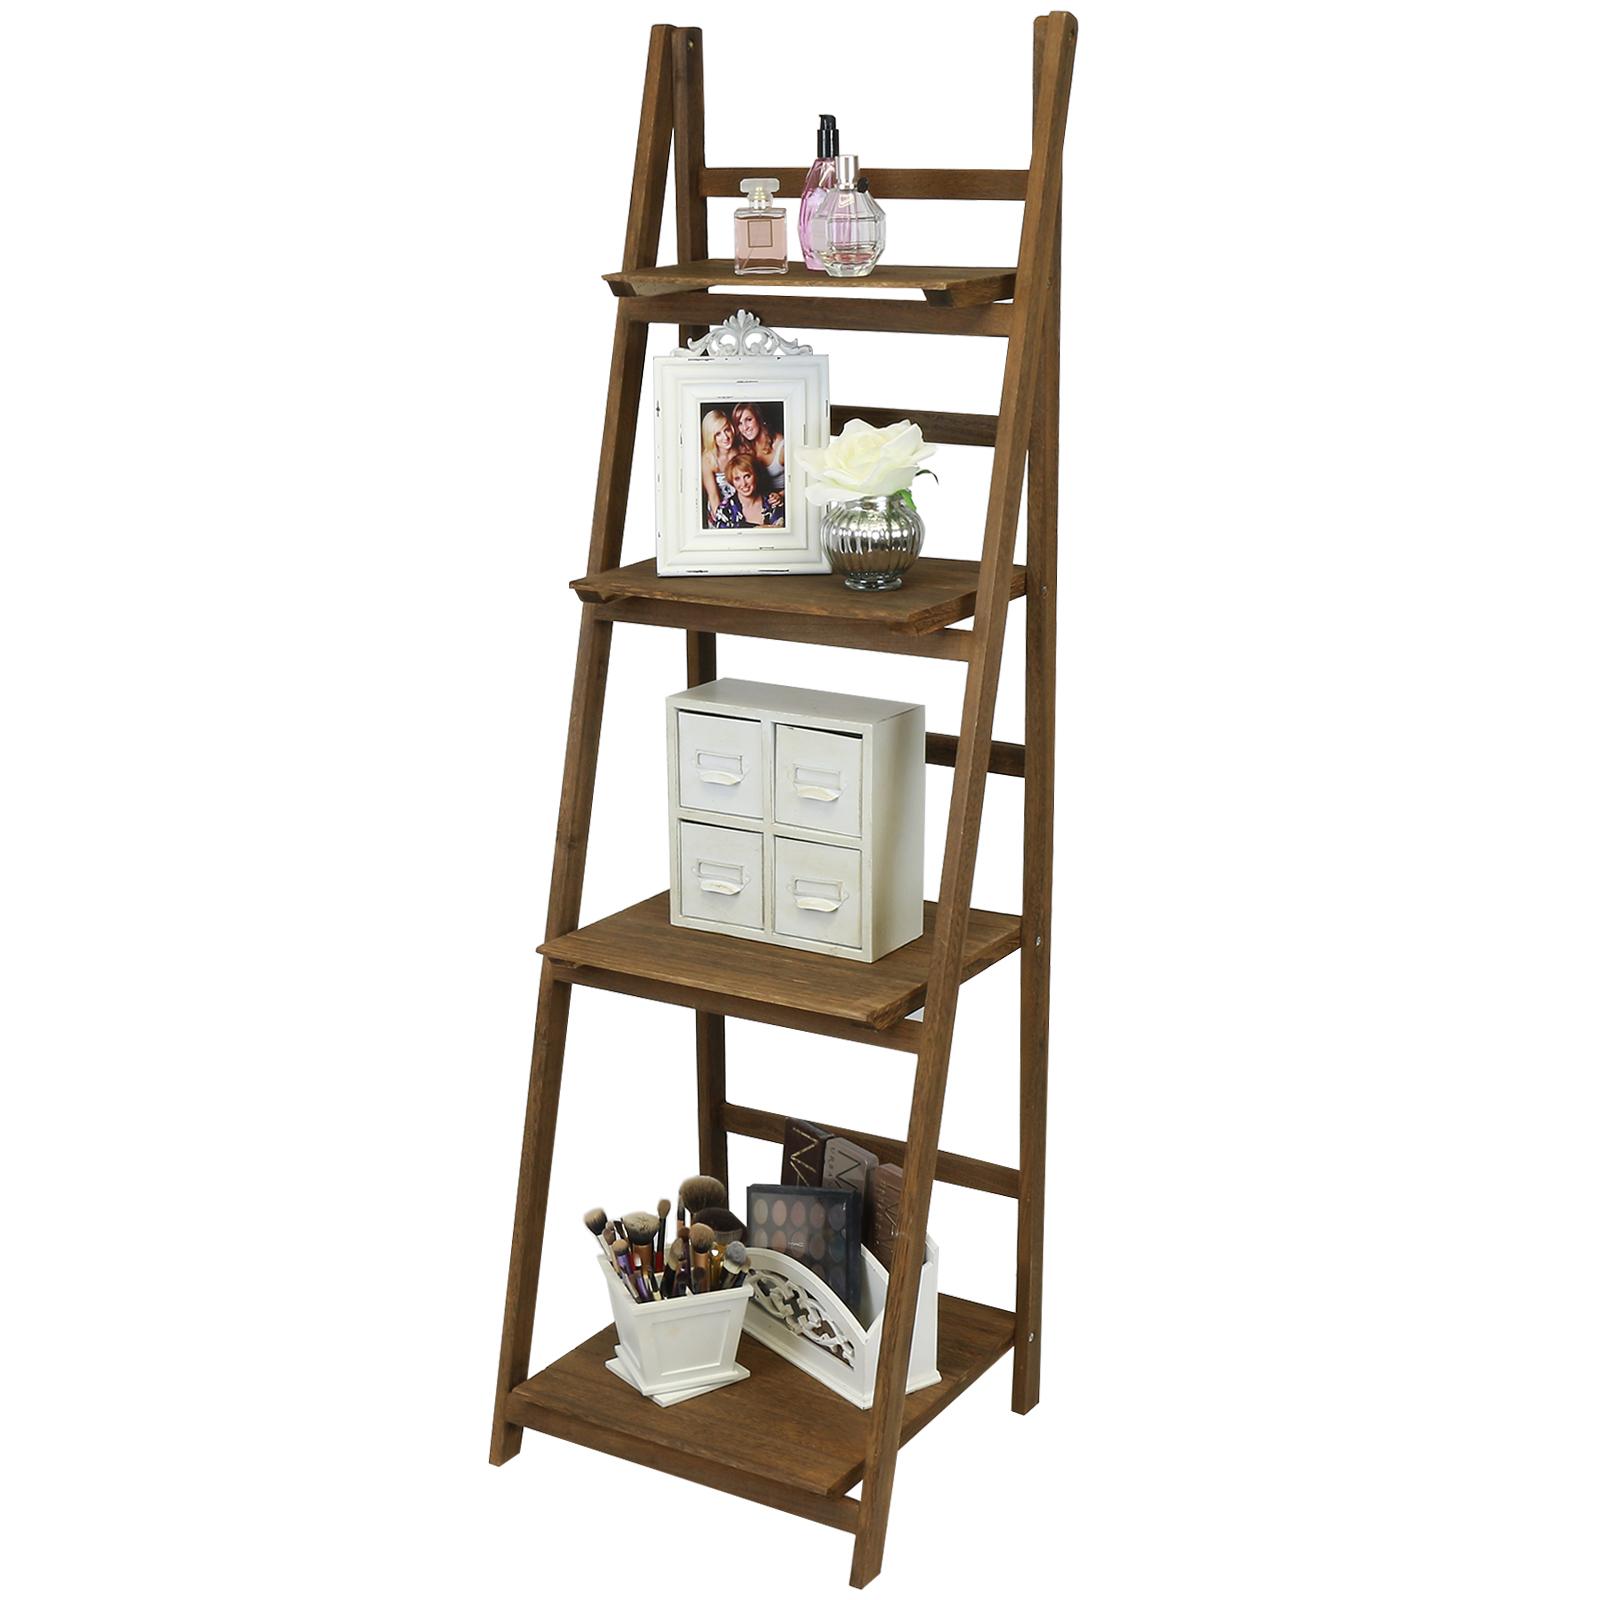 Hartleys Brown 4 Tier Folding Ladder Storage Home Display Shelf Bedroom Bathroom